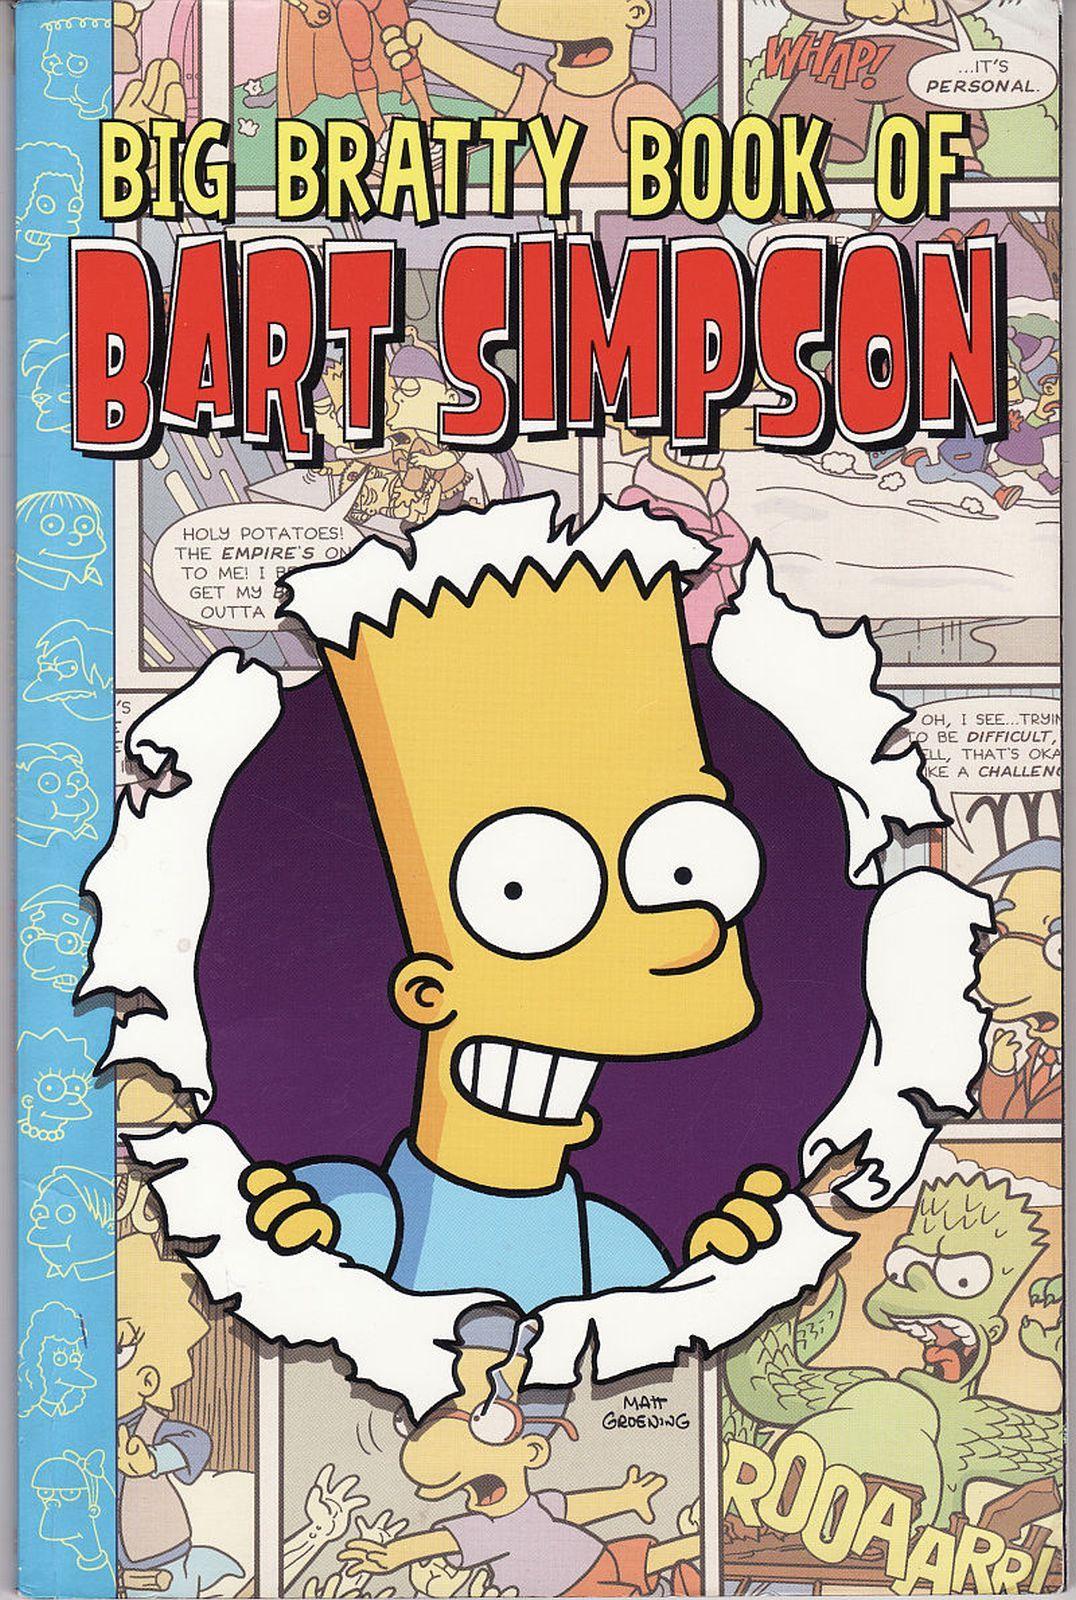 2004 Big Bratty Book Of Bart Simpson Comic Collection Matt Groening 1st Ed. PB